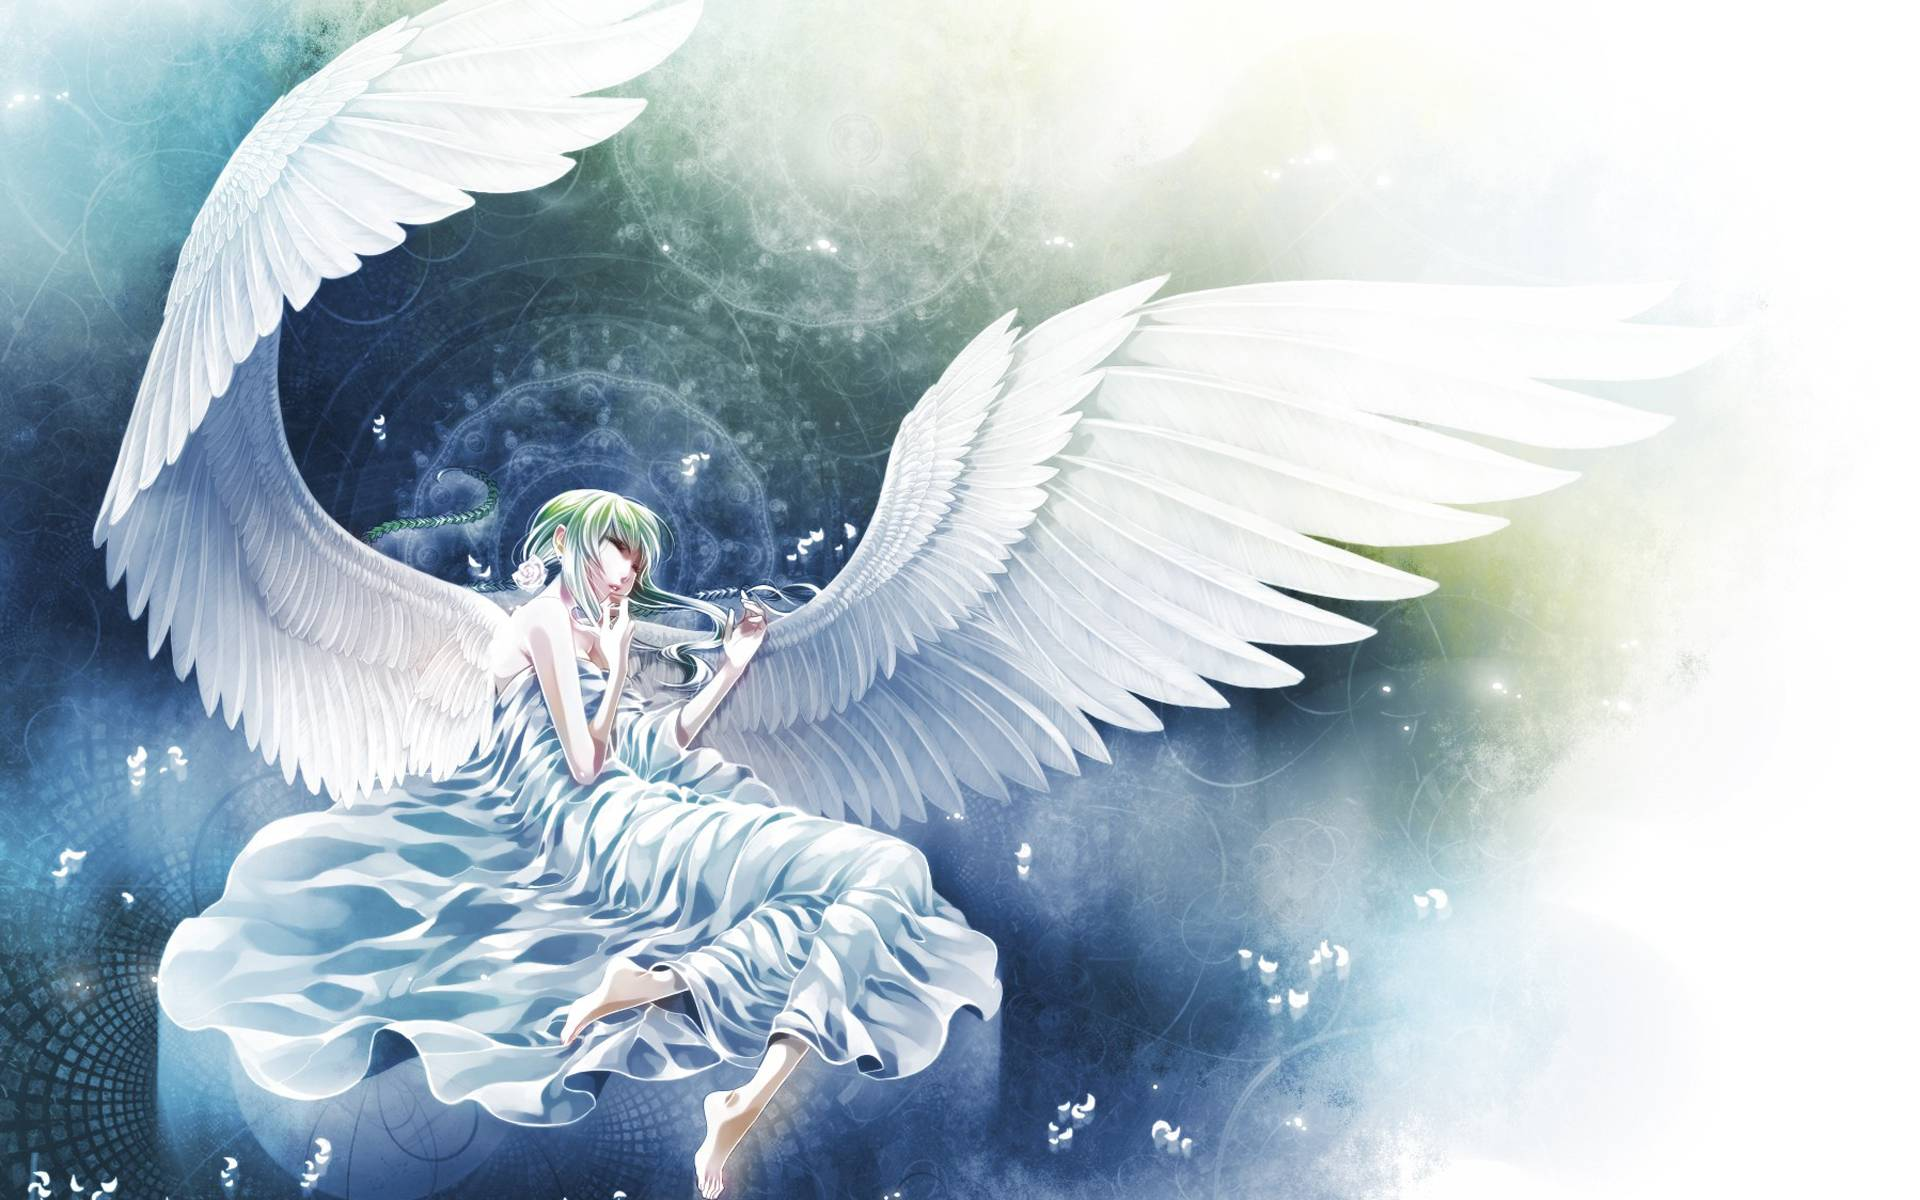 Beautiful white angel   Anime Manga Wallpaper 1920x1200